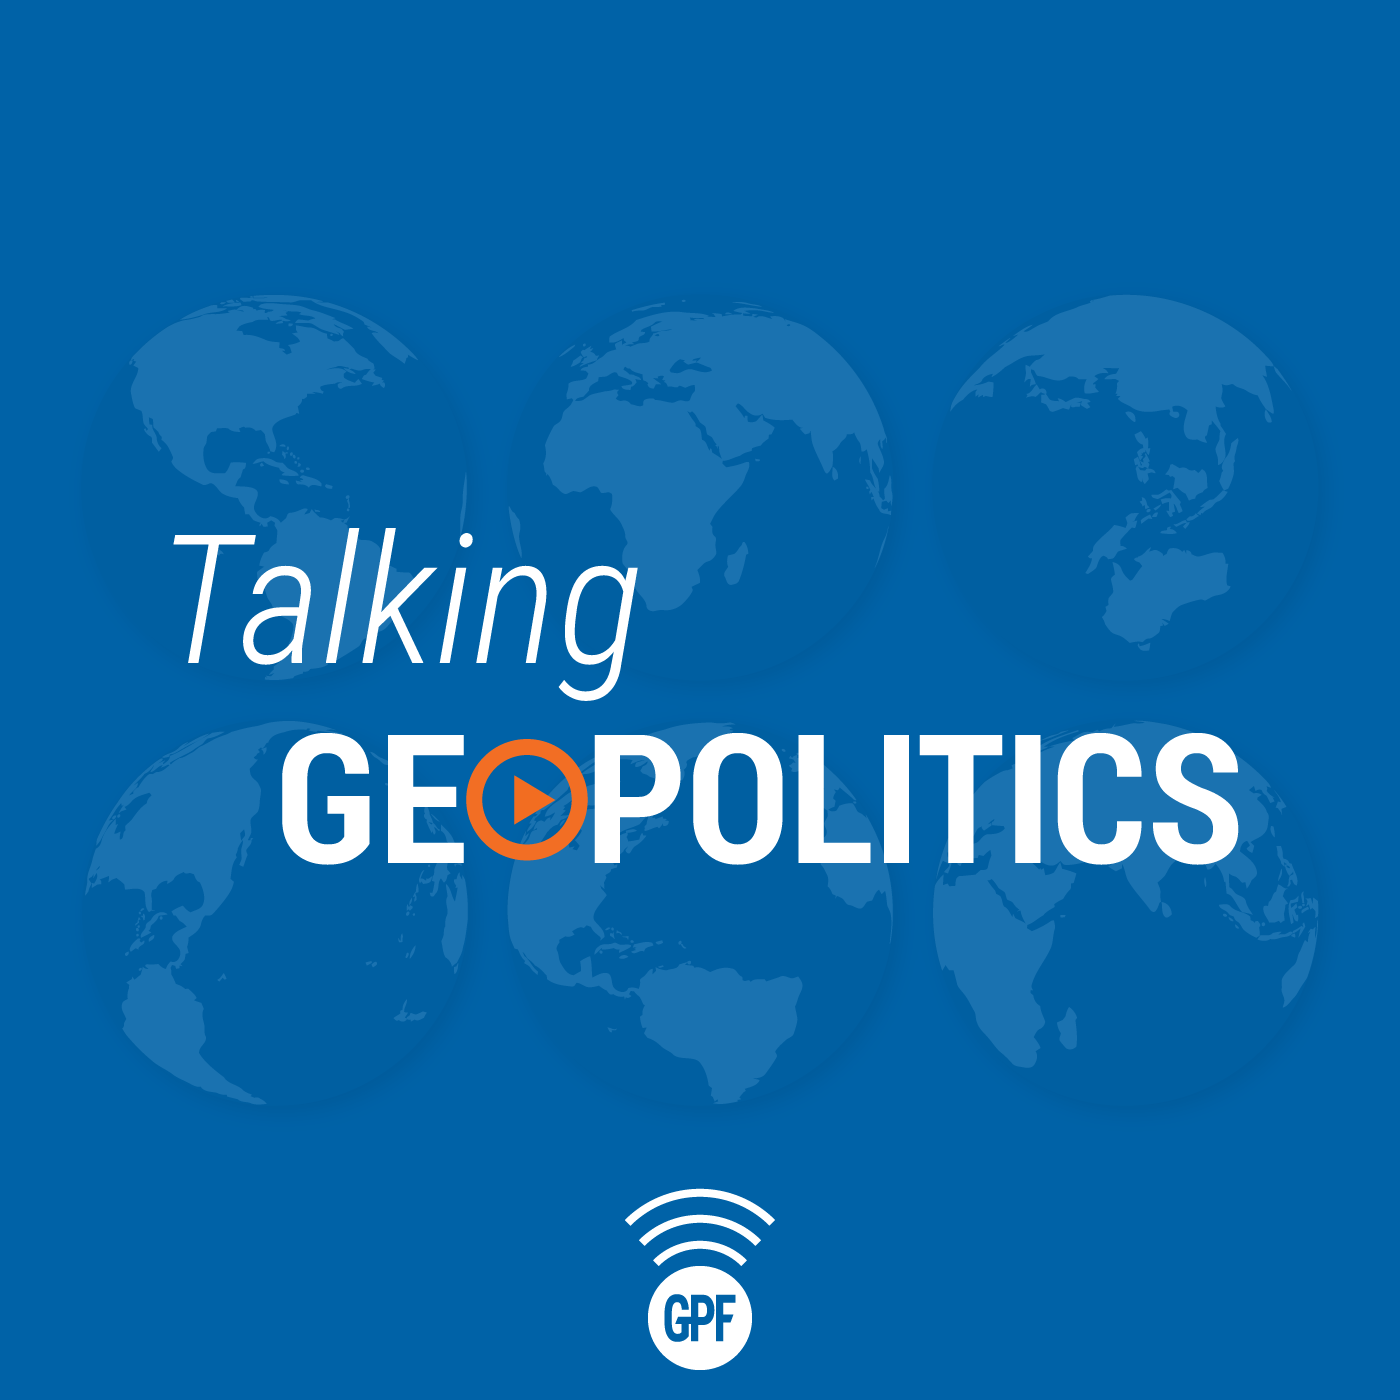 Talking Geopolitics podcast show image